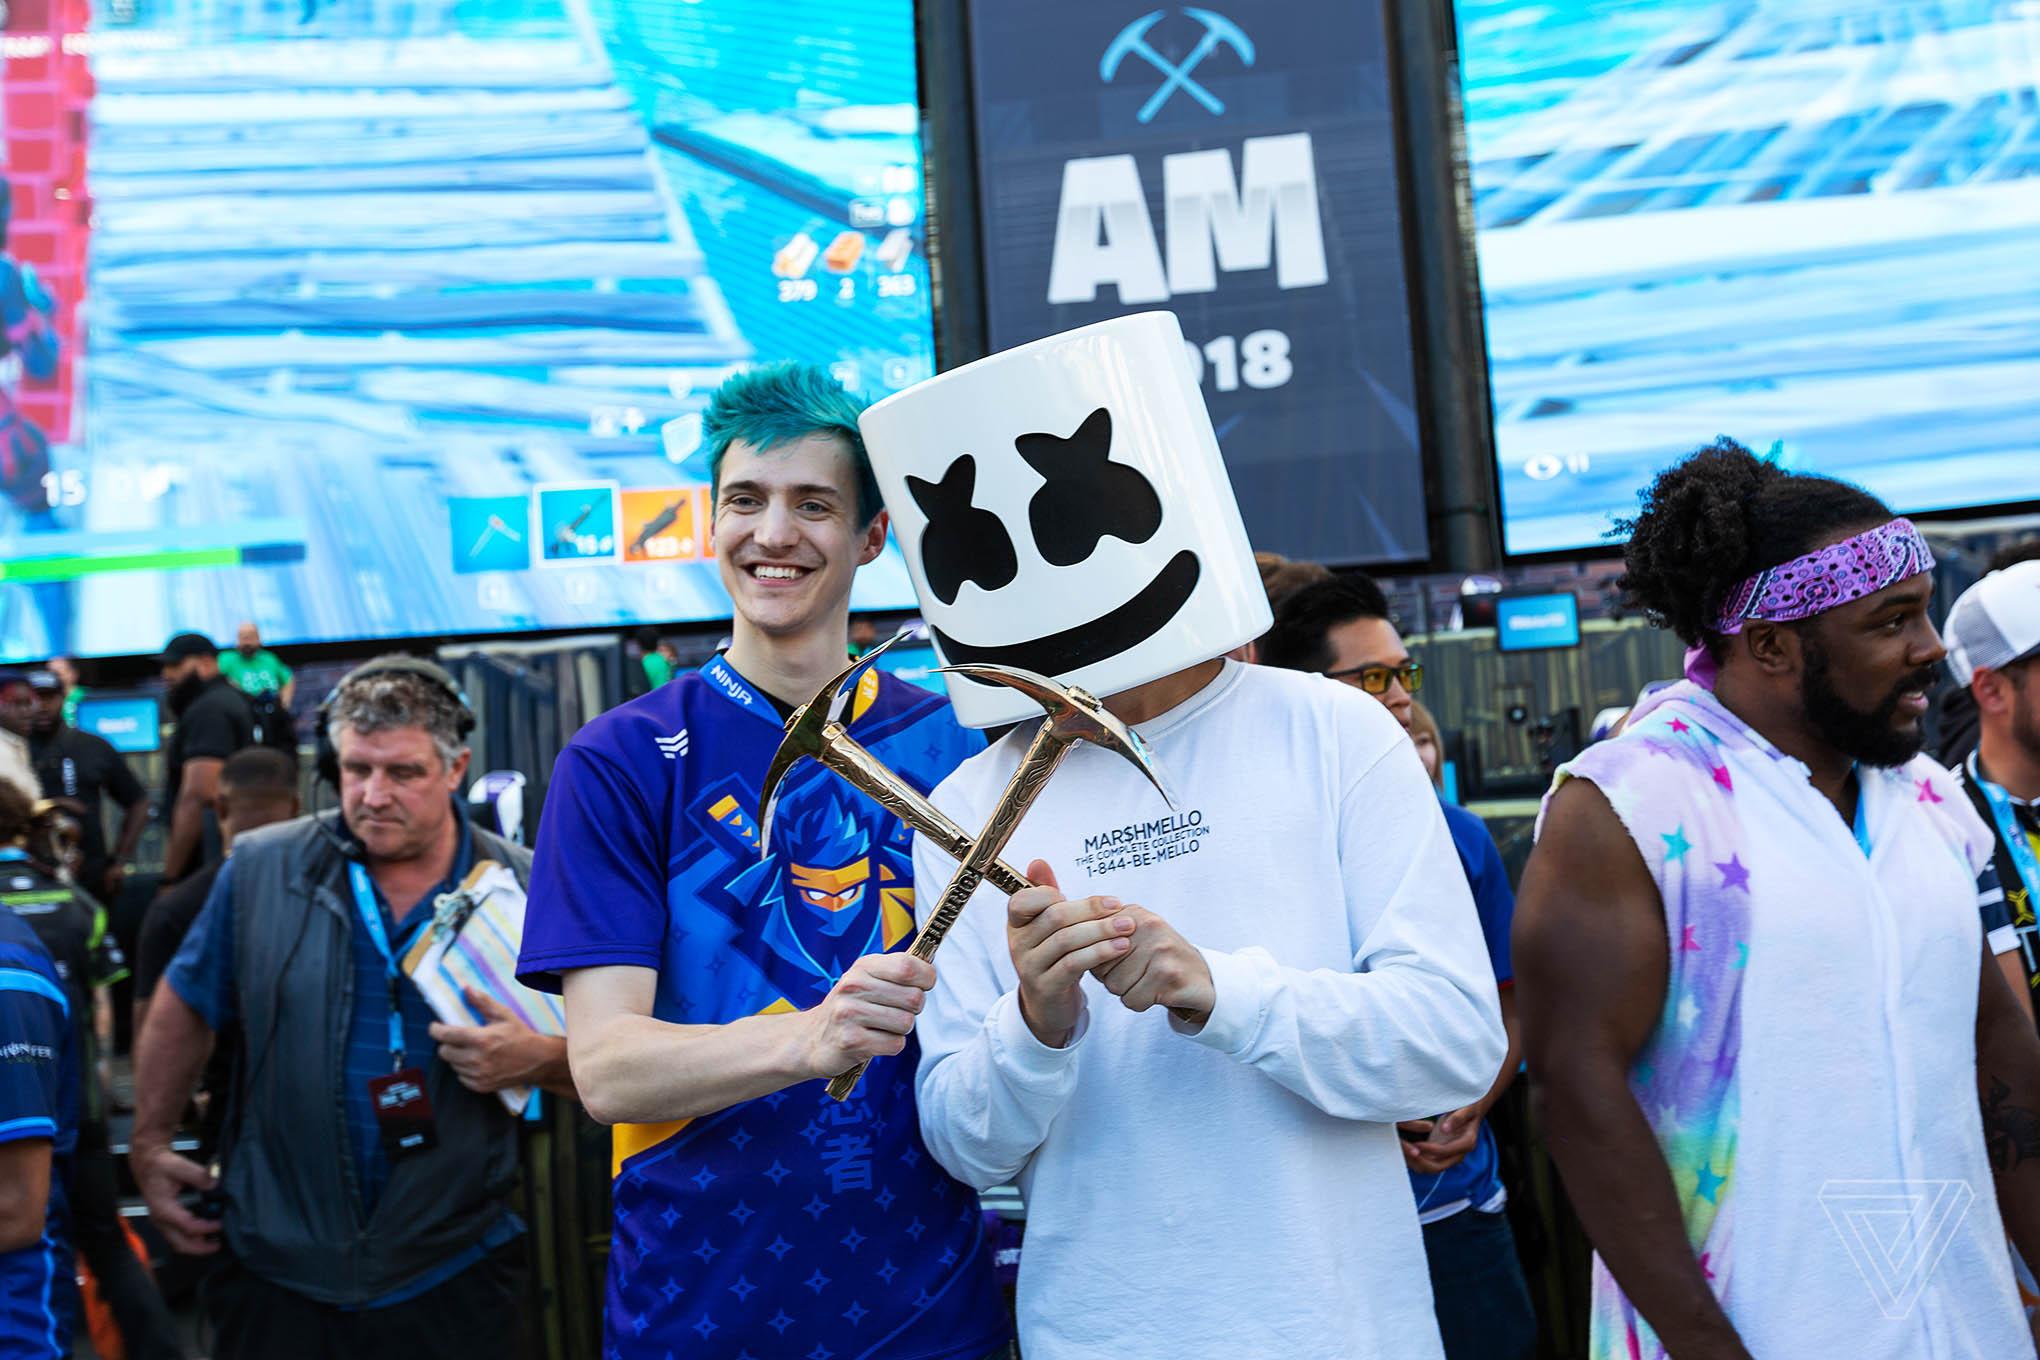 fortnite s celebrity tournament felt like a trial run for epic s grand e sports ambitions - evenement fortnite e3